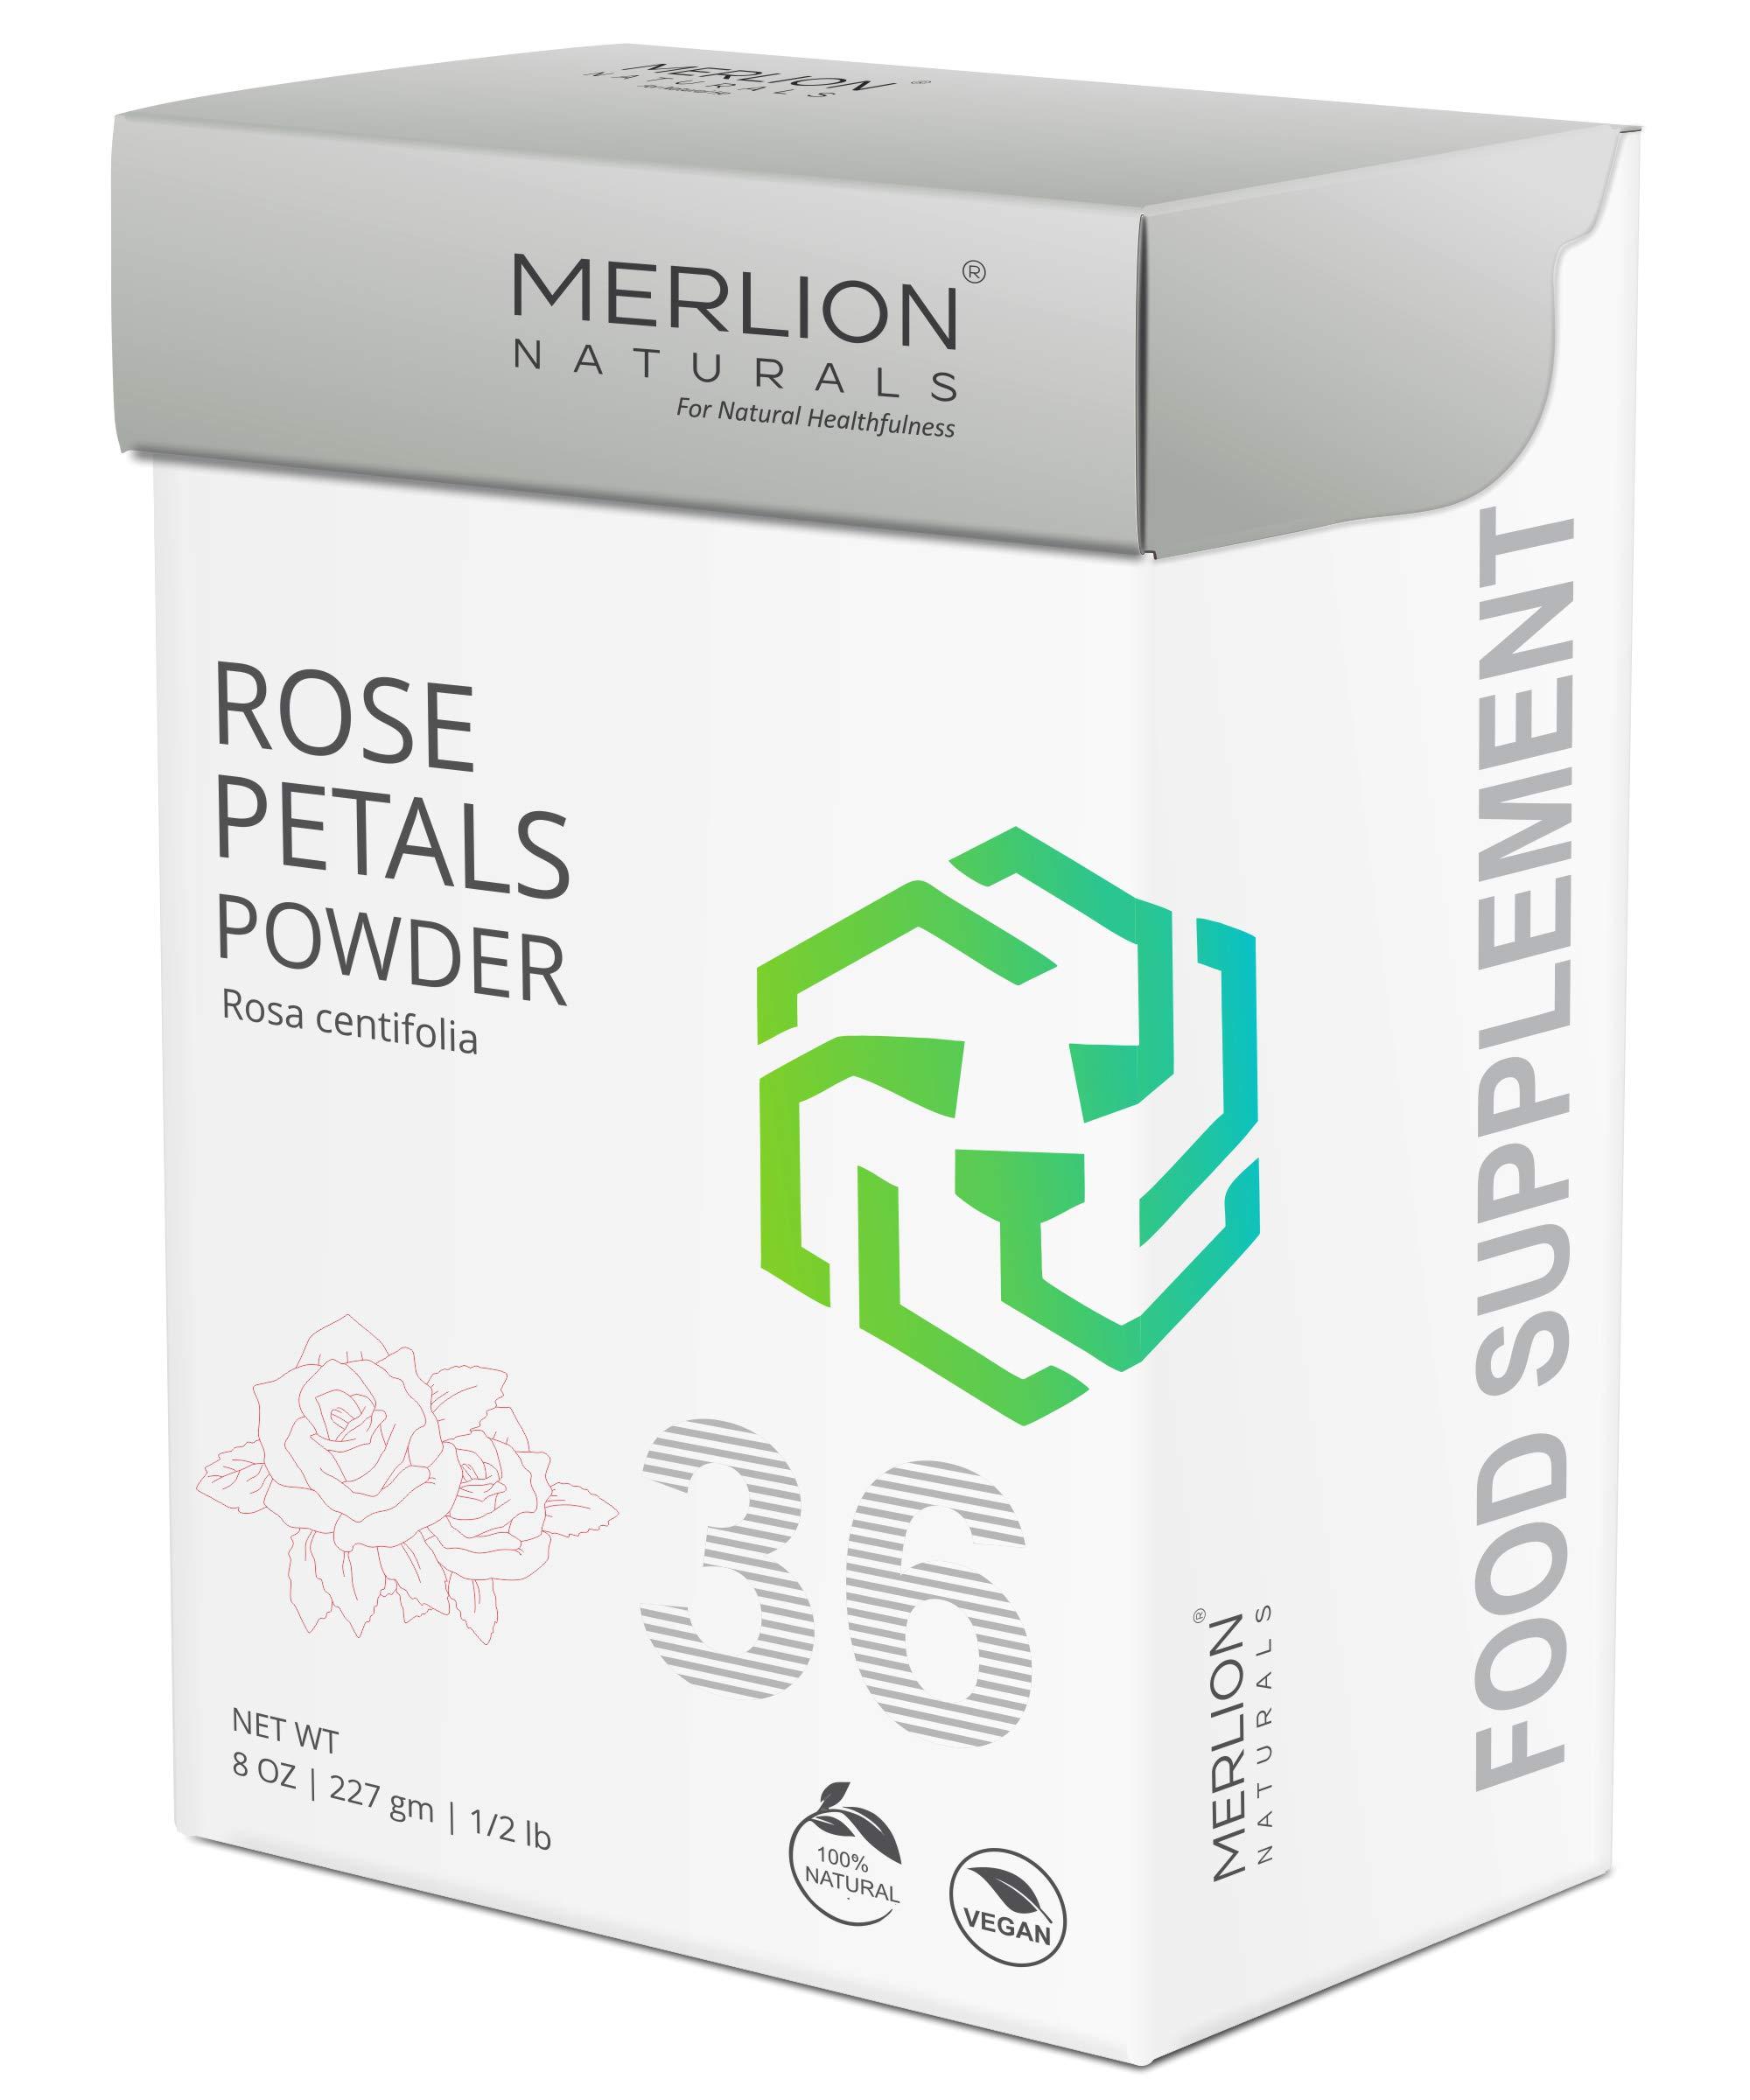 Rose Petals Powder by Merlion Naturals | Rosa centifolia | 100% Natural (8 OZ)